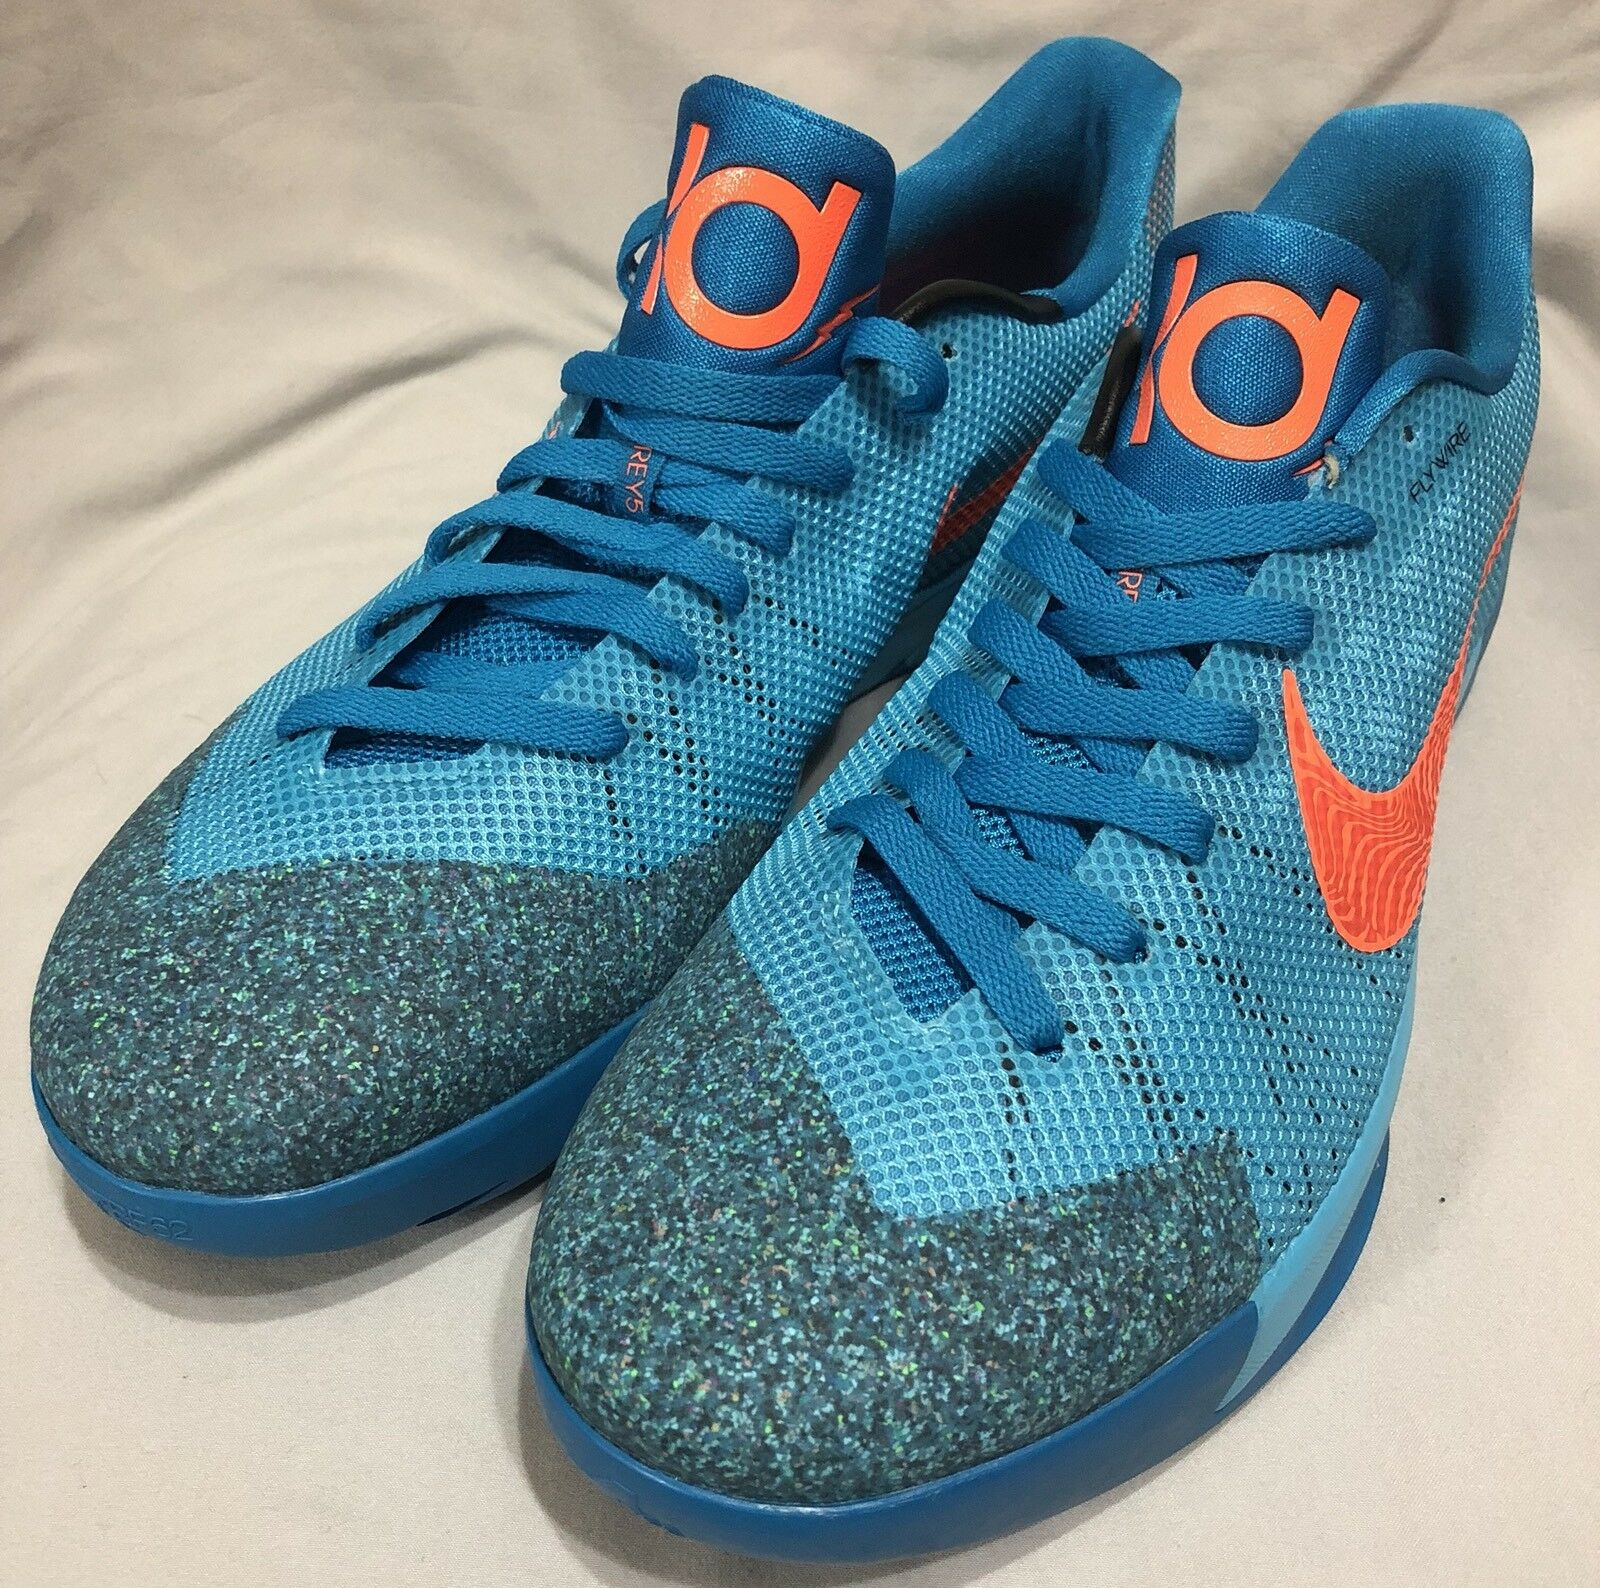 Nike KD Trey 5 II Clearwater Orange Basketball Shoes Size 13 653657-488